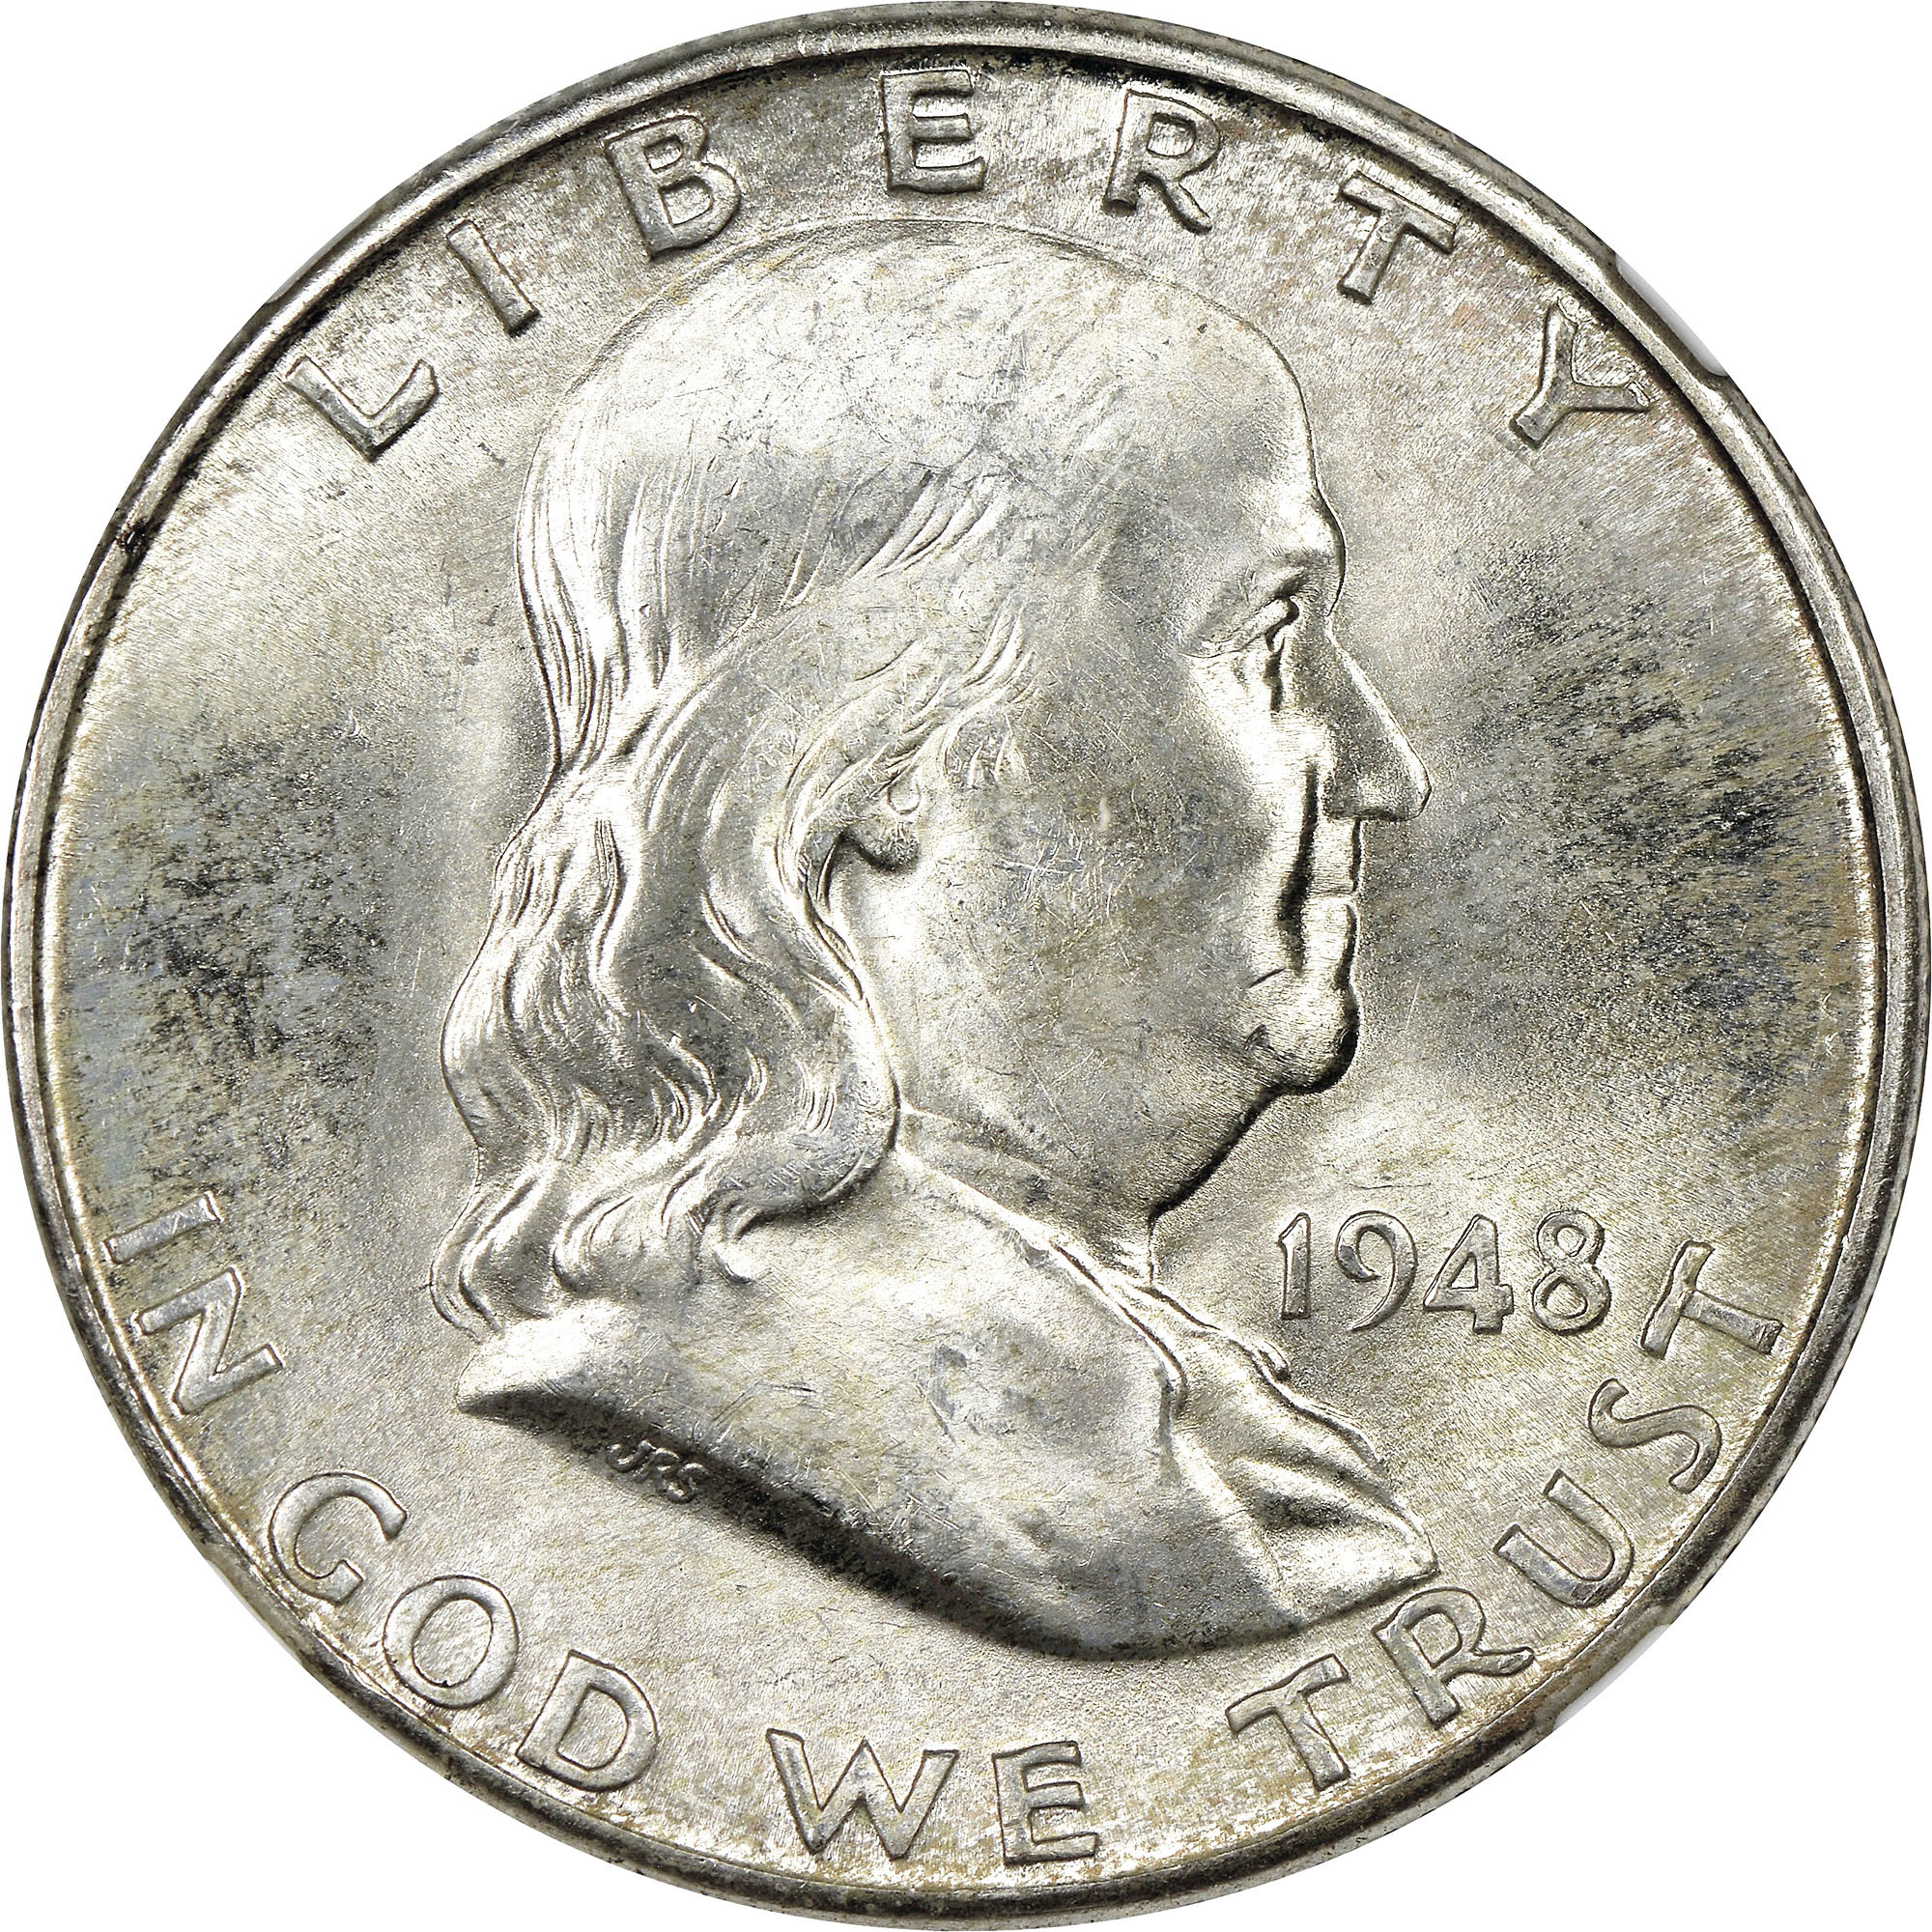 1948 D 50c Franklin Silver Half Dollar US Coin VG Very Good